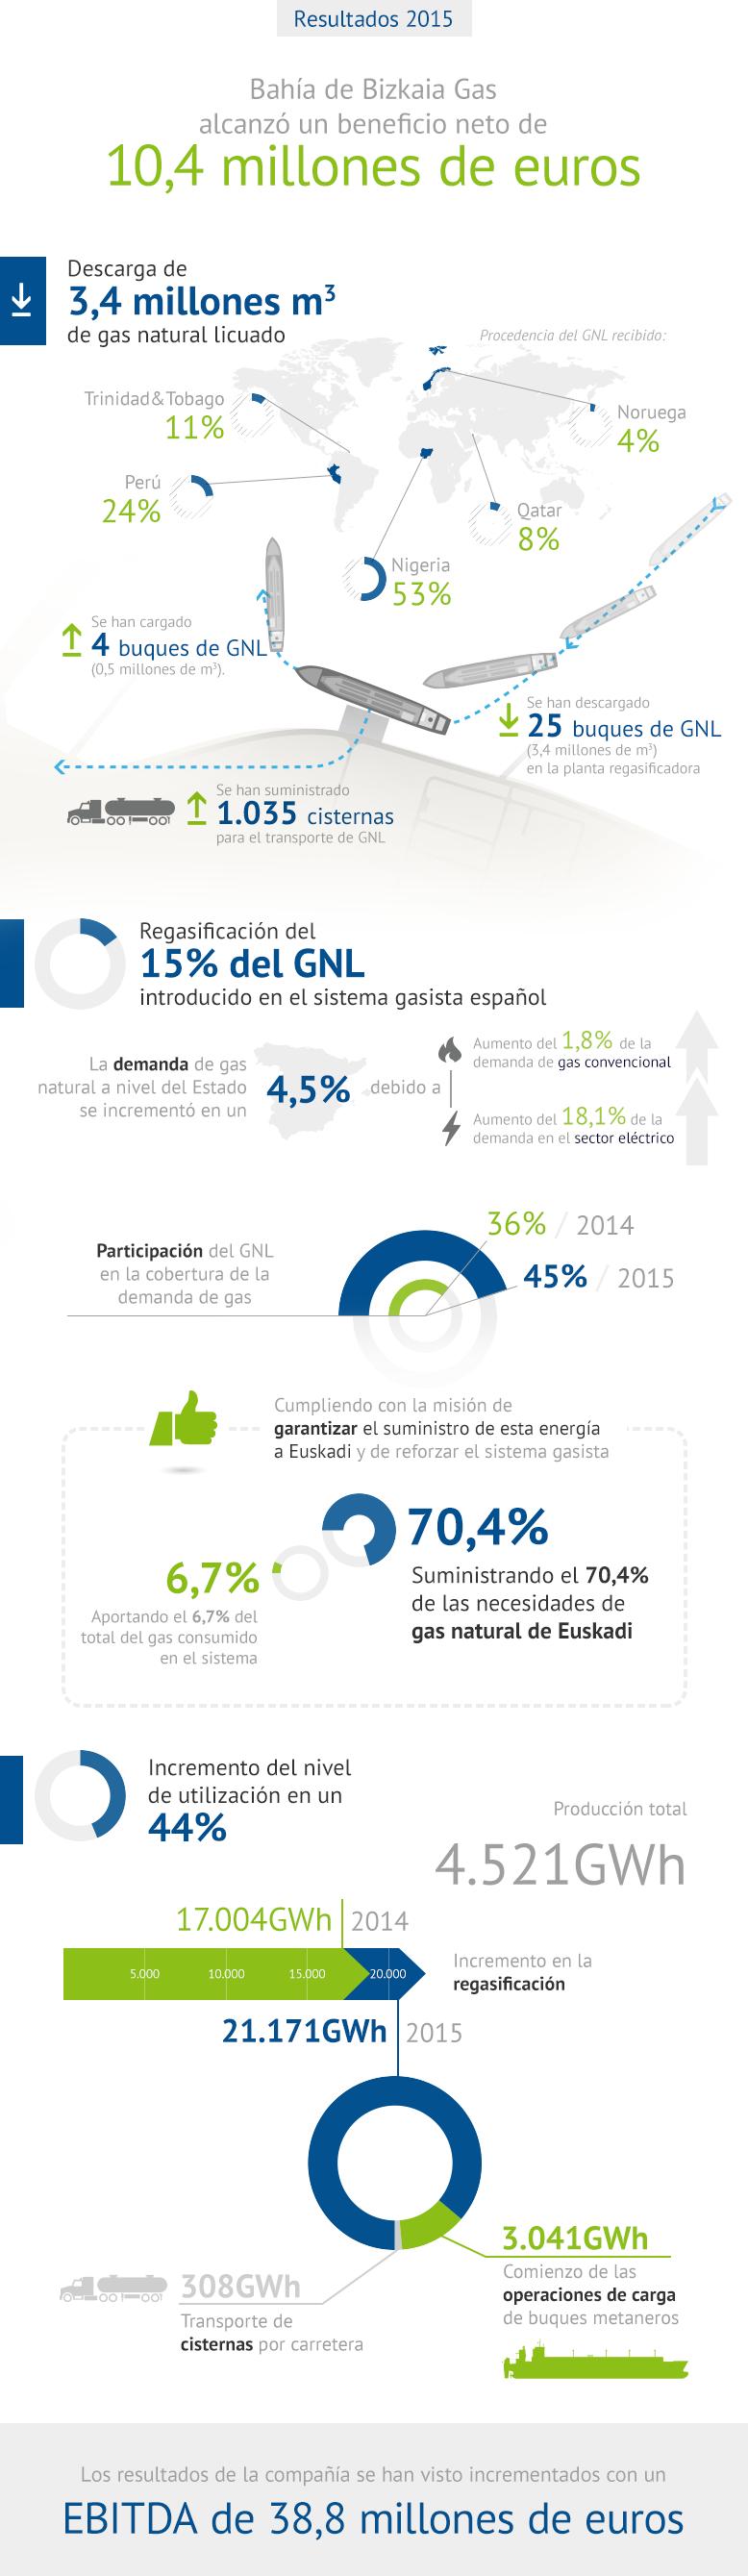 Infografía Resultados BBG 2015